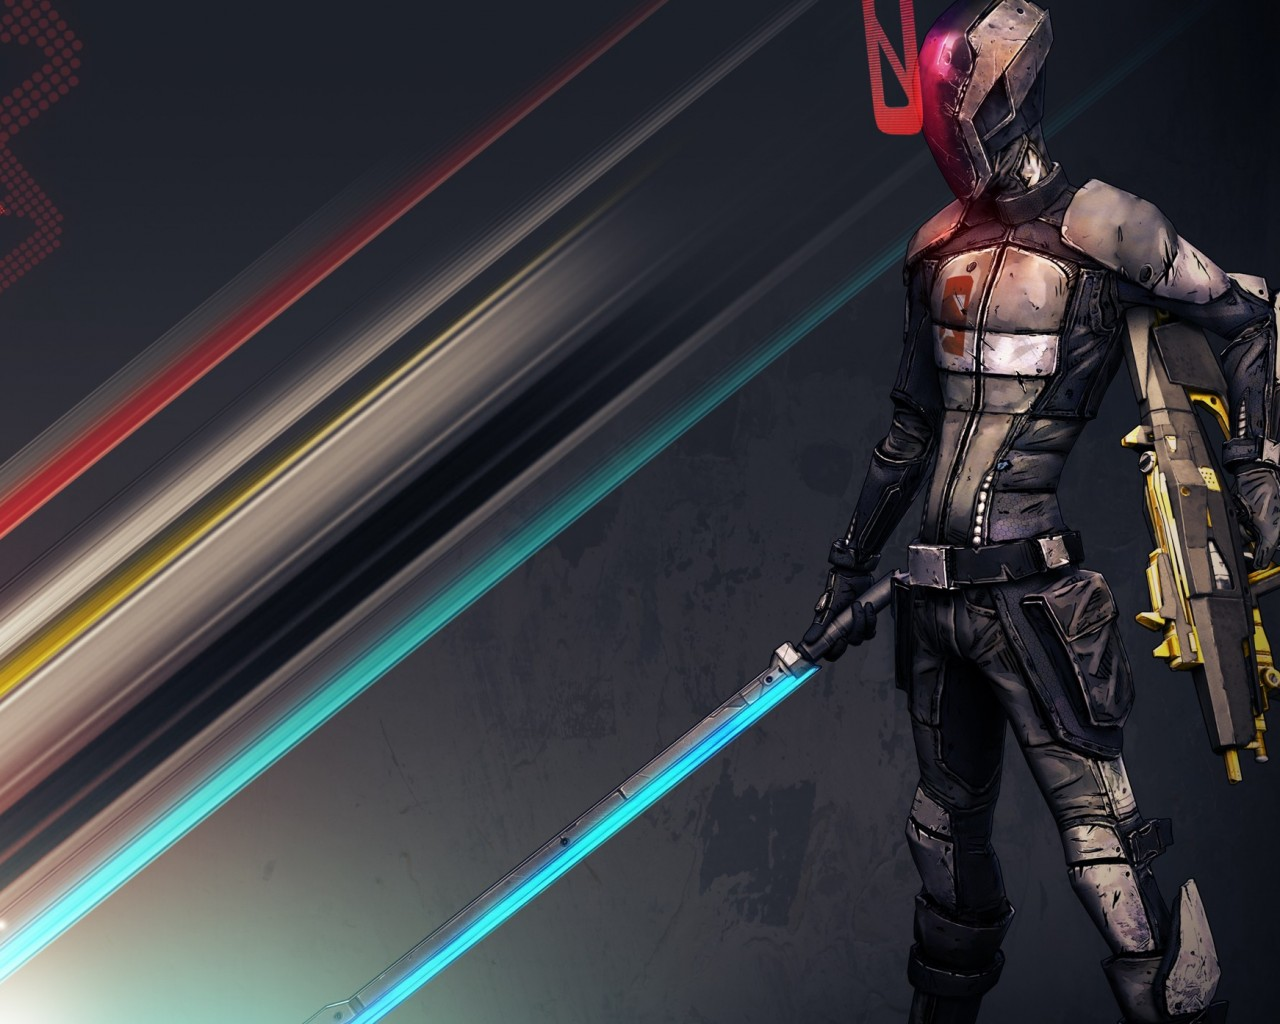 Zer0 Borderlands 2 , HD Wallpaper & Backgrounds